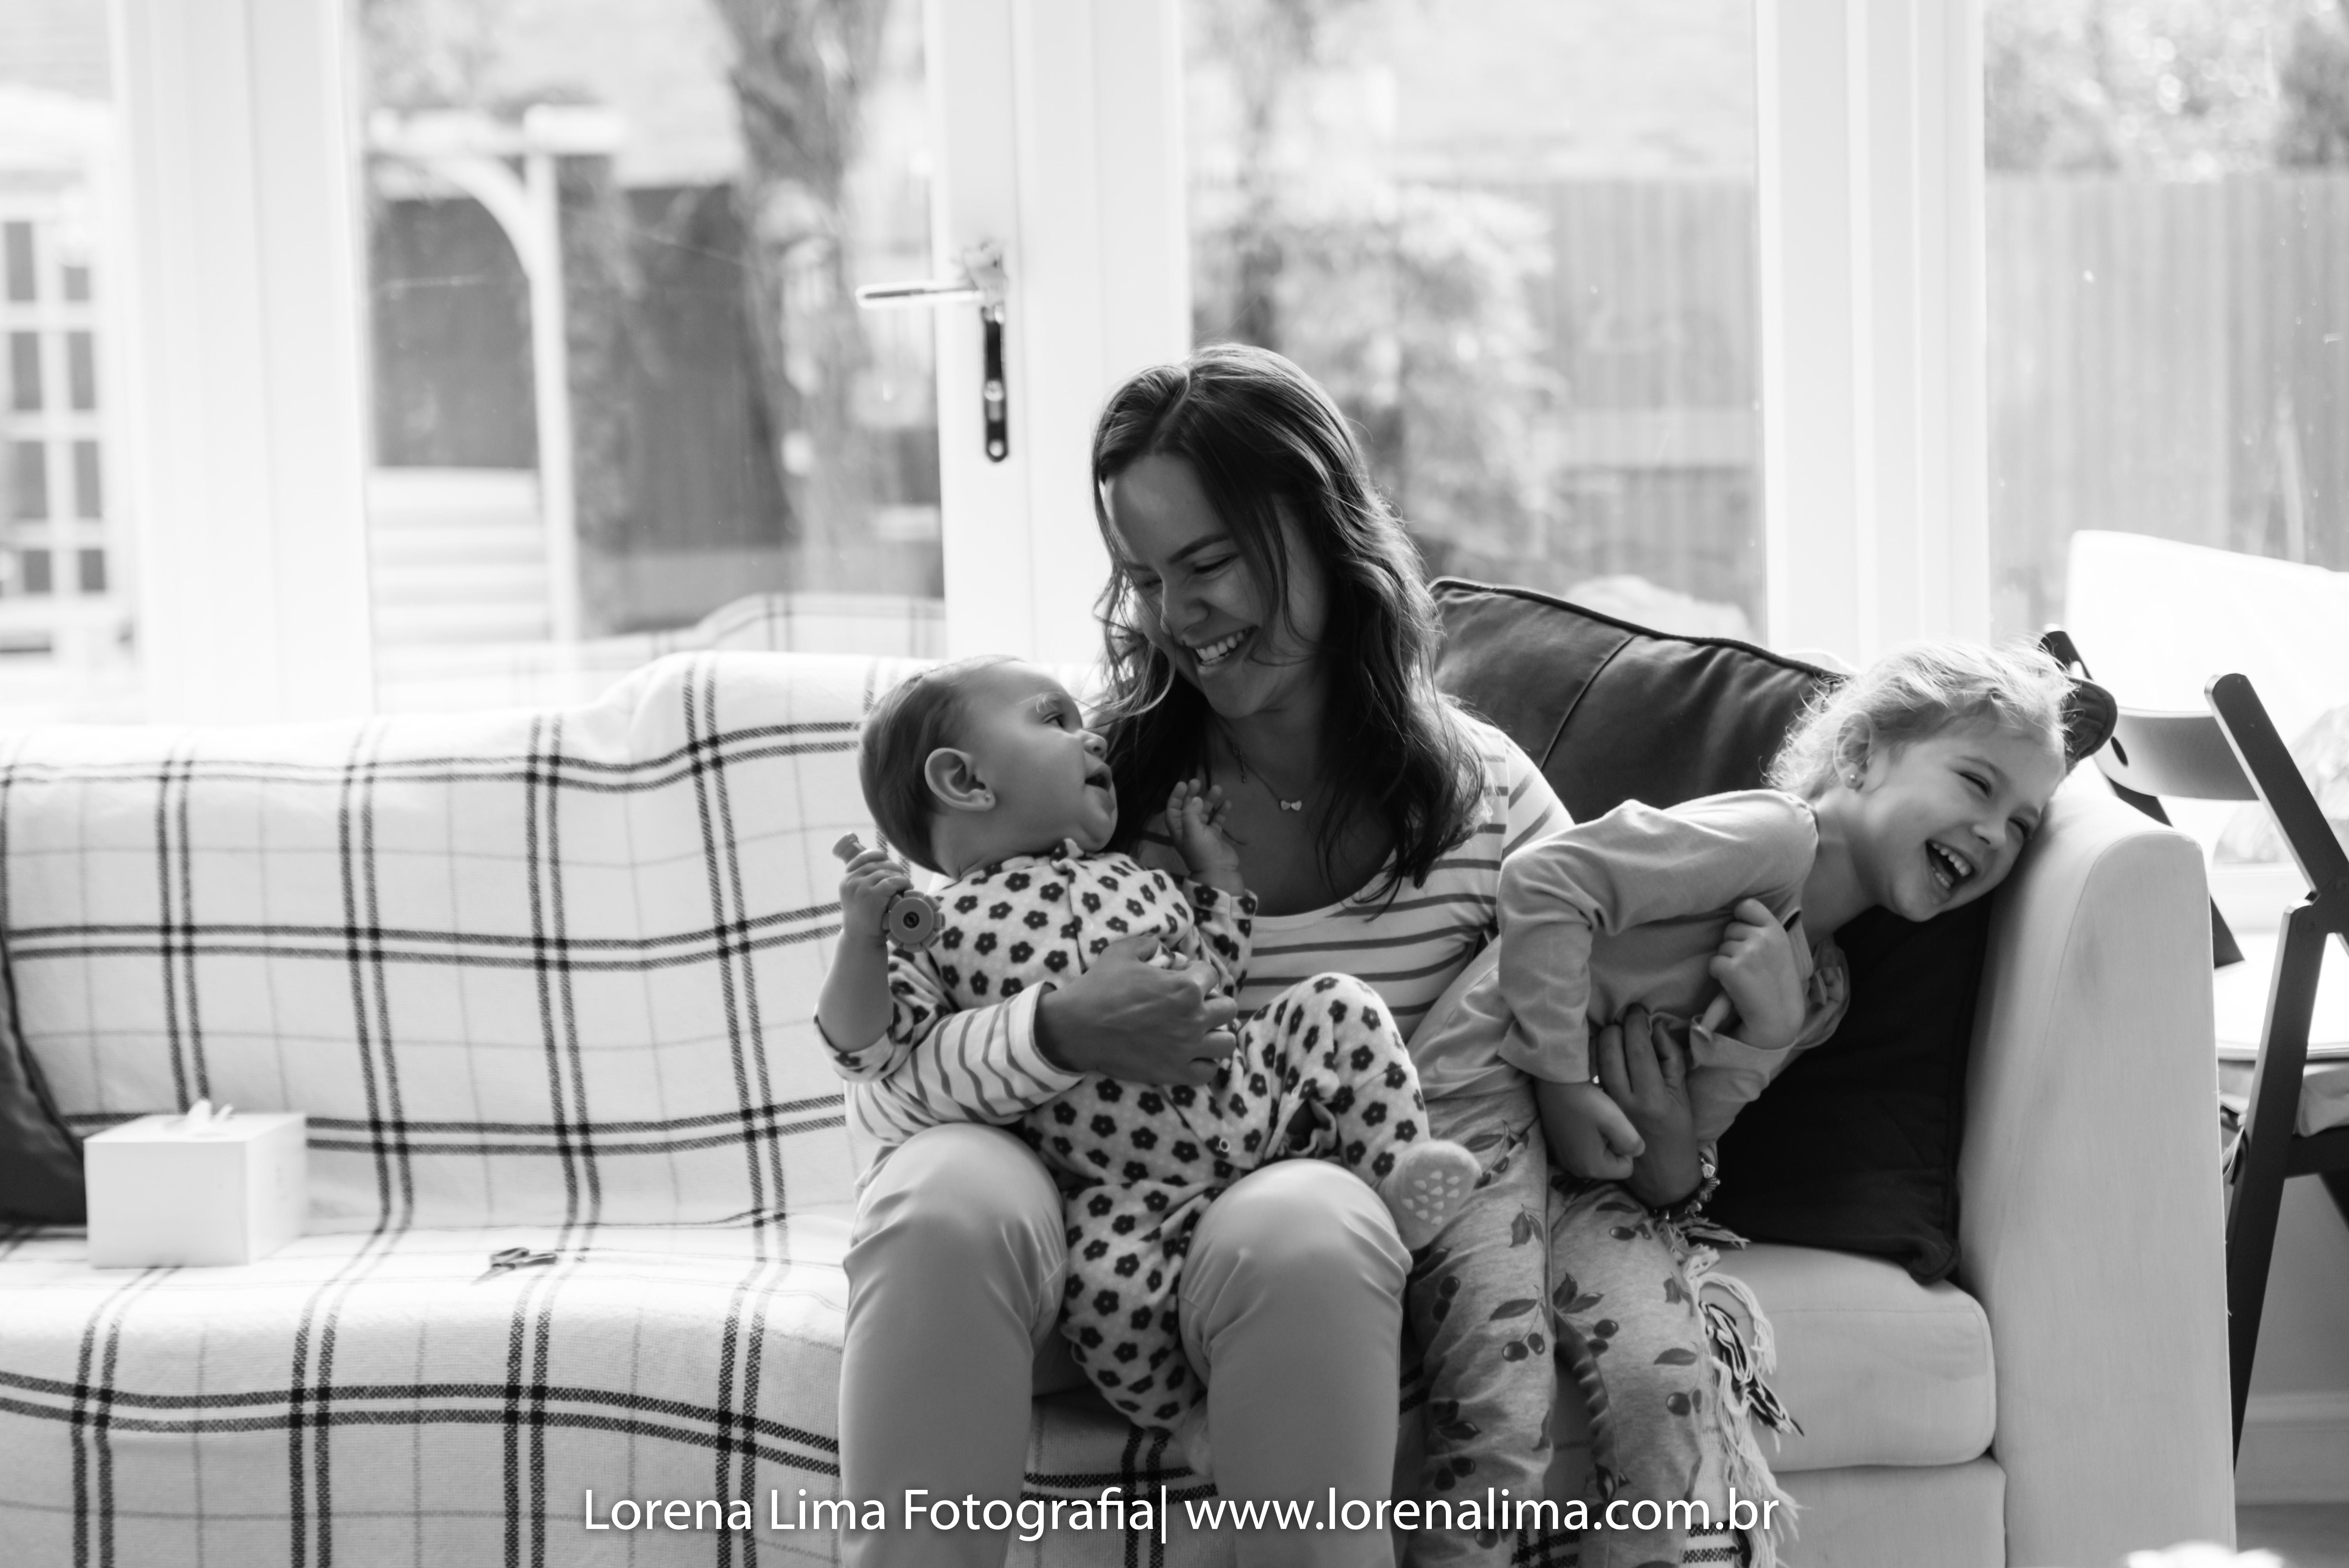 Fotografia documental de família | Projeto Vida de mãe